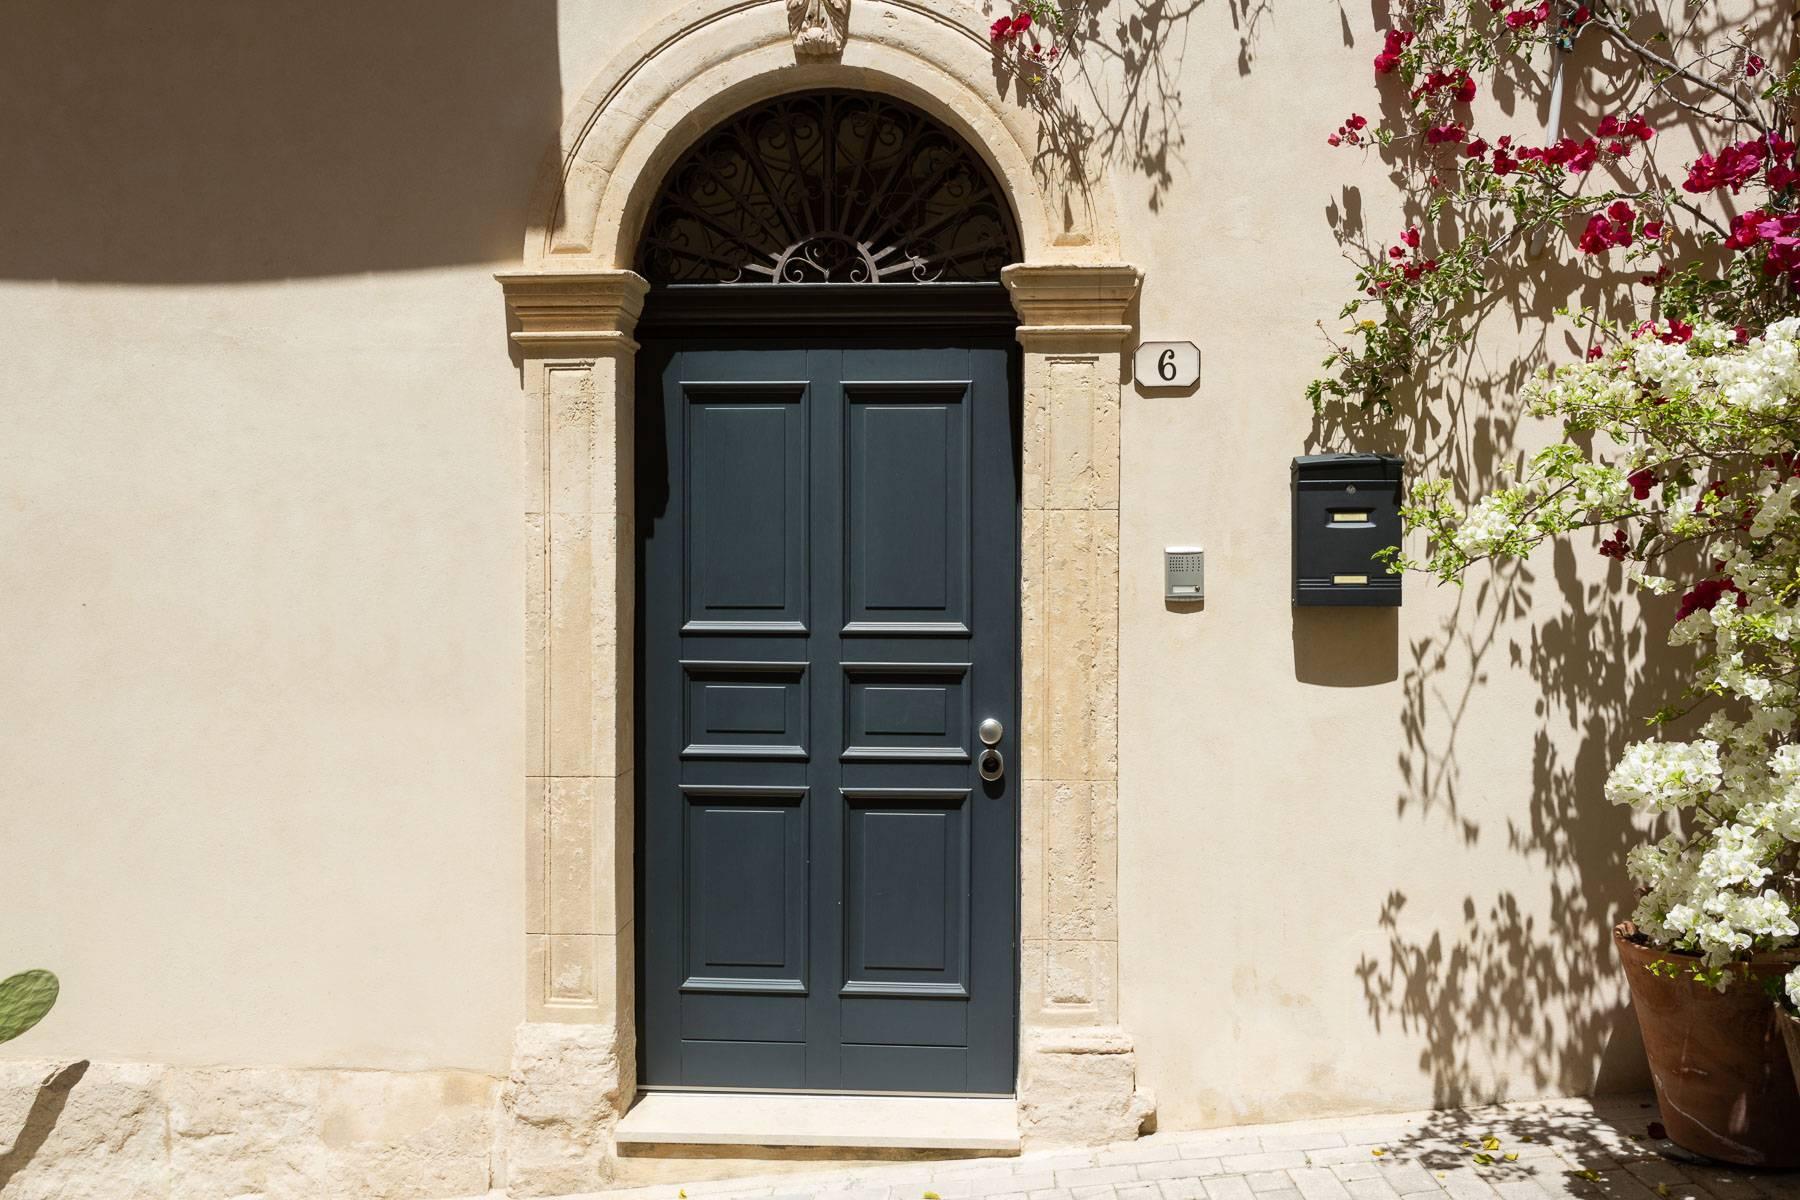 Casa indipendente in Vendita a Noto: 5 locali, 171 mq - Foto 15